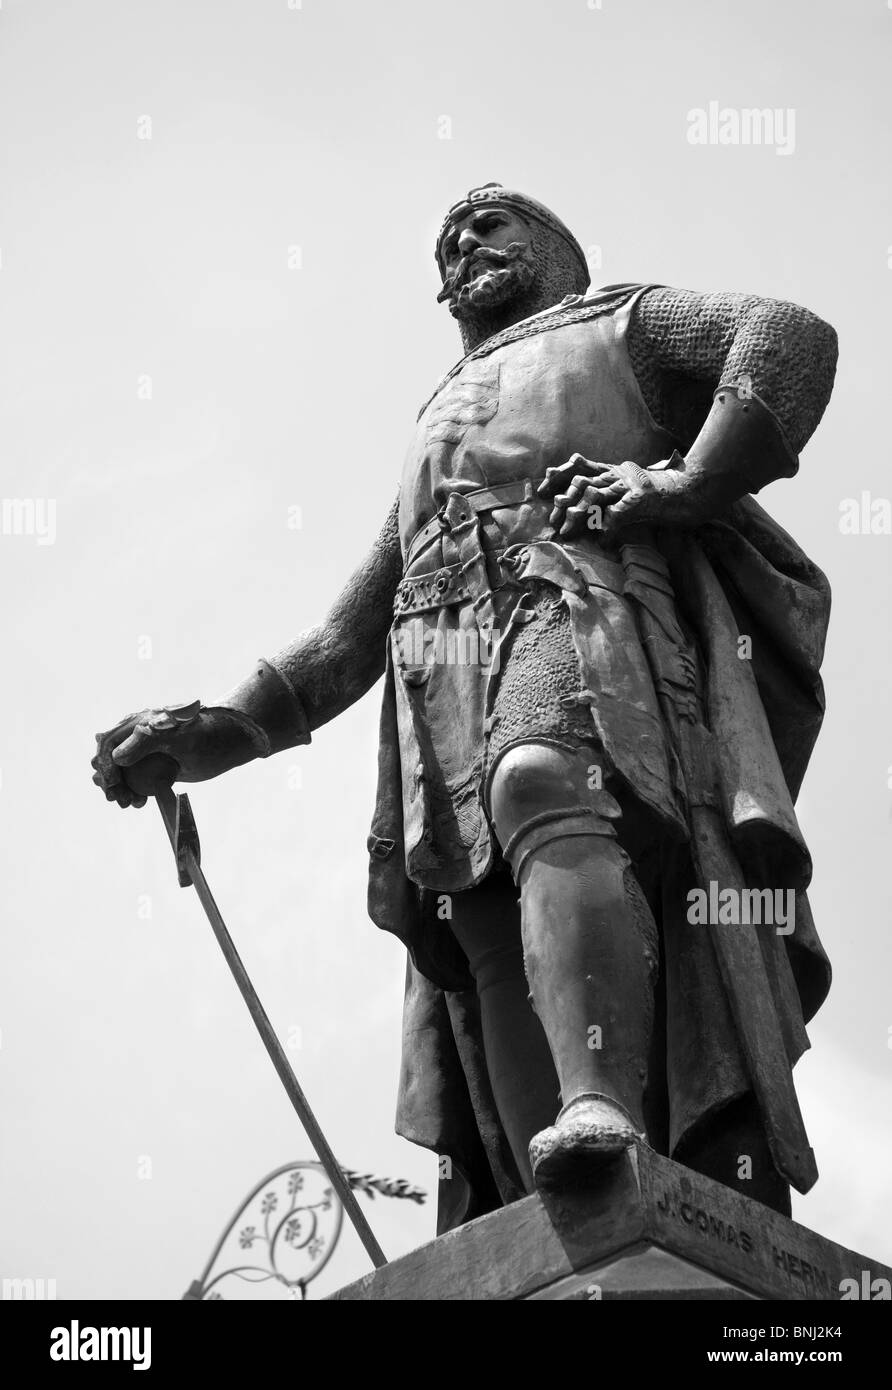 knight statue from Barcelona - Passieg Luis Companyos - Stock Image